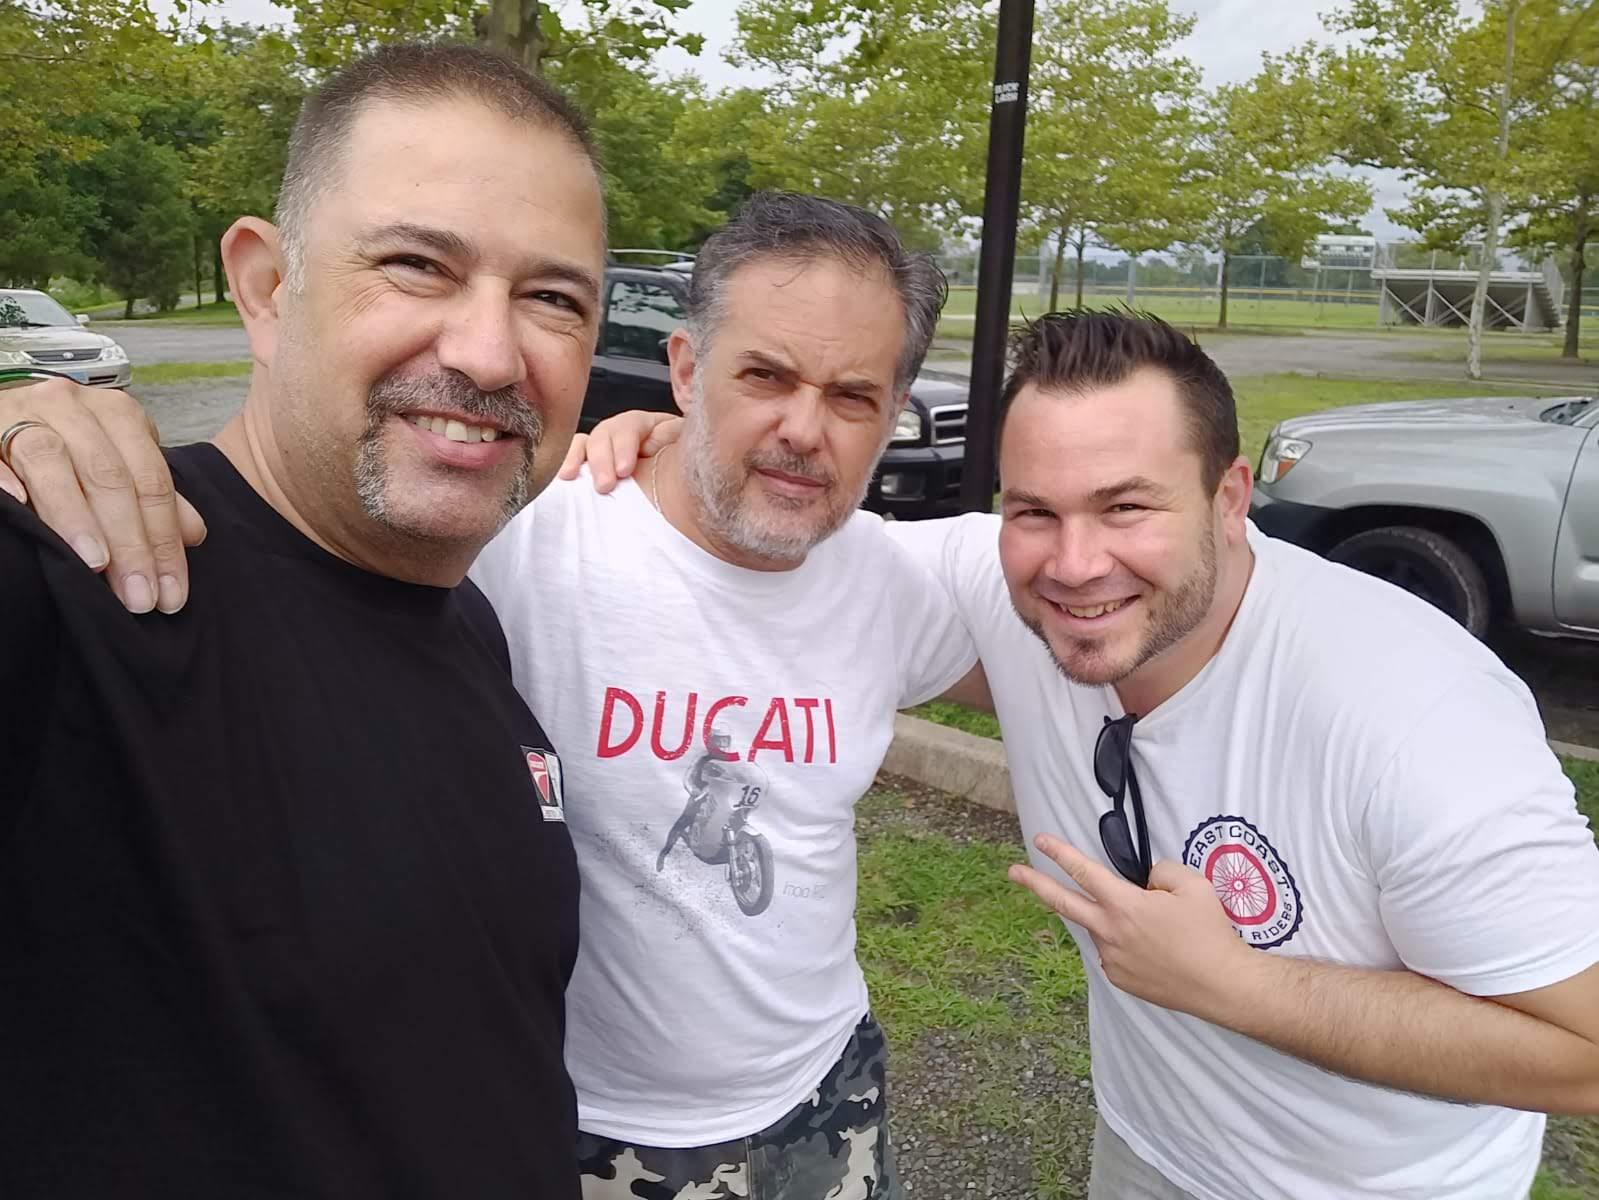 DOCIsrael Daniel, DesmoDucati's Sandro and Tigh Loughhead from Gotham Ducati